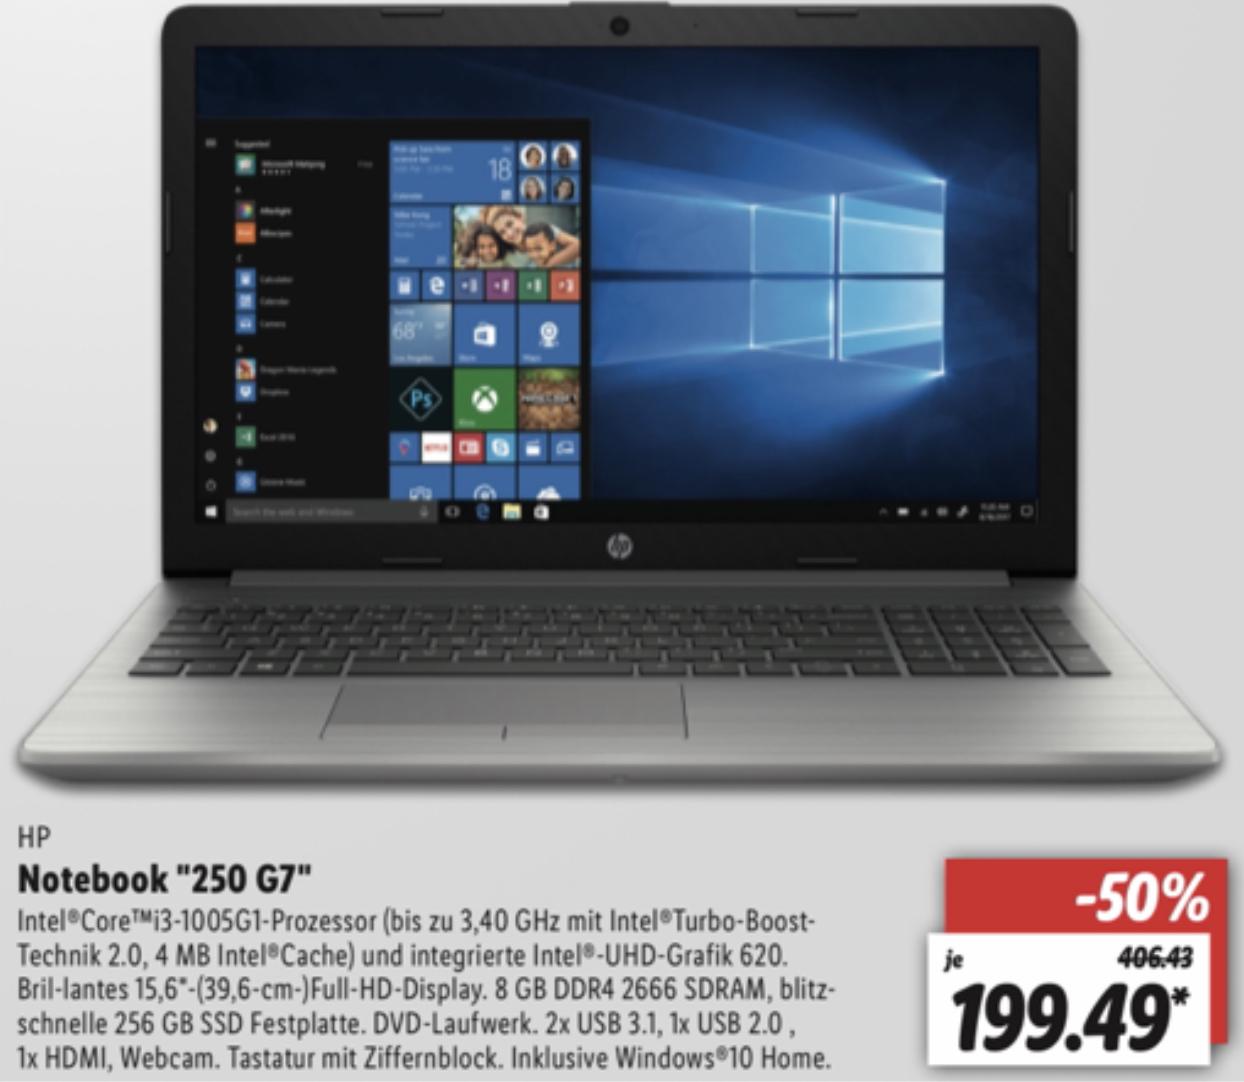 "Lokal Lidl Rostock: HP Notebook 250 G7 15,6"" FHD, Intel Core i3, 8GB SDRAM 256GB SSD, Win10 für 199,49€ - ab 02.07."